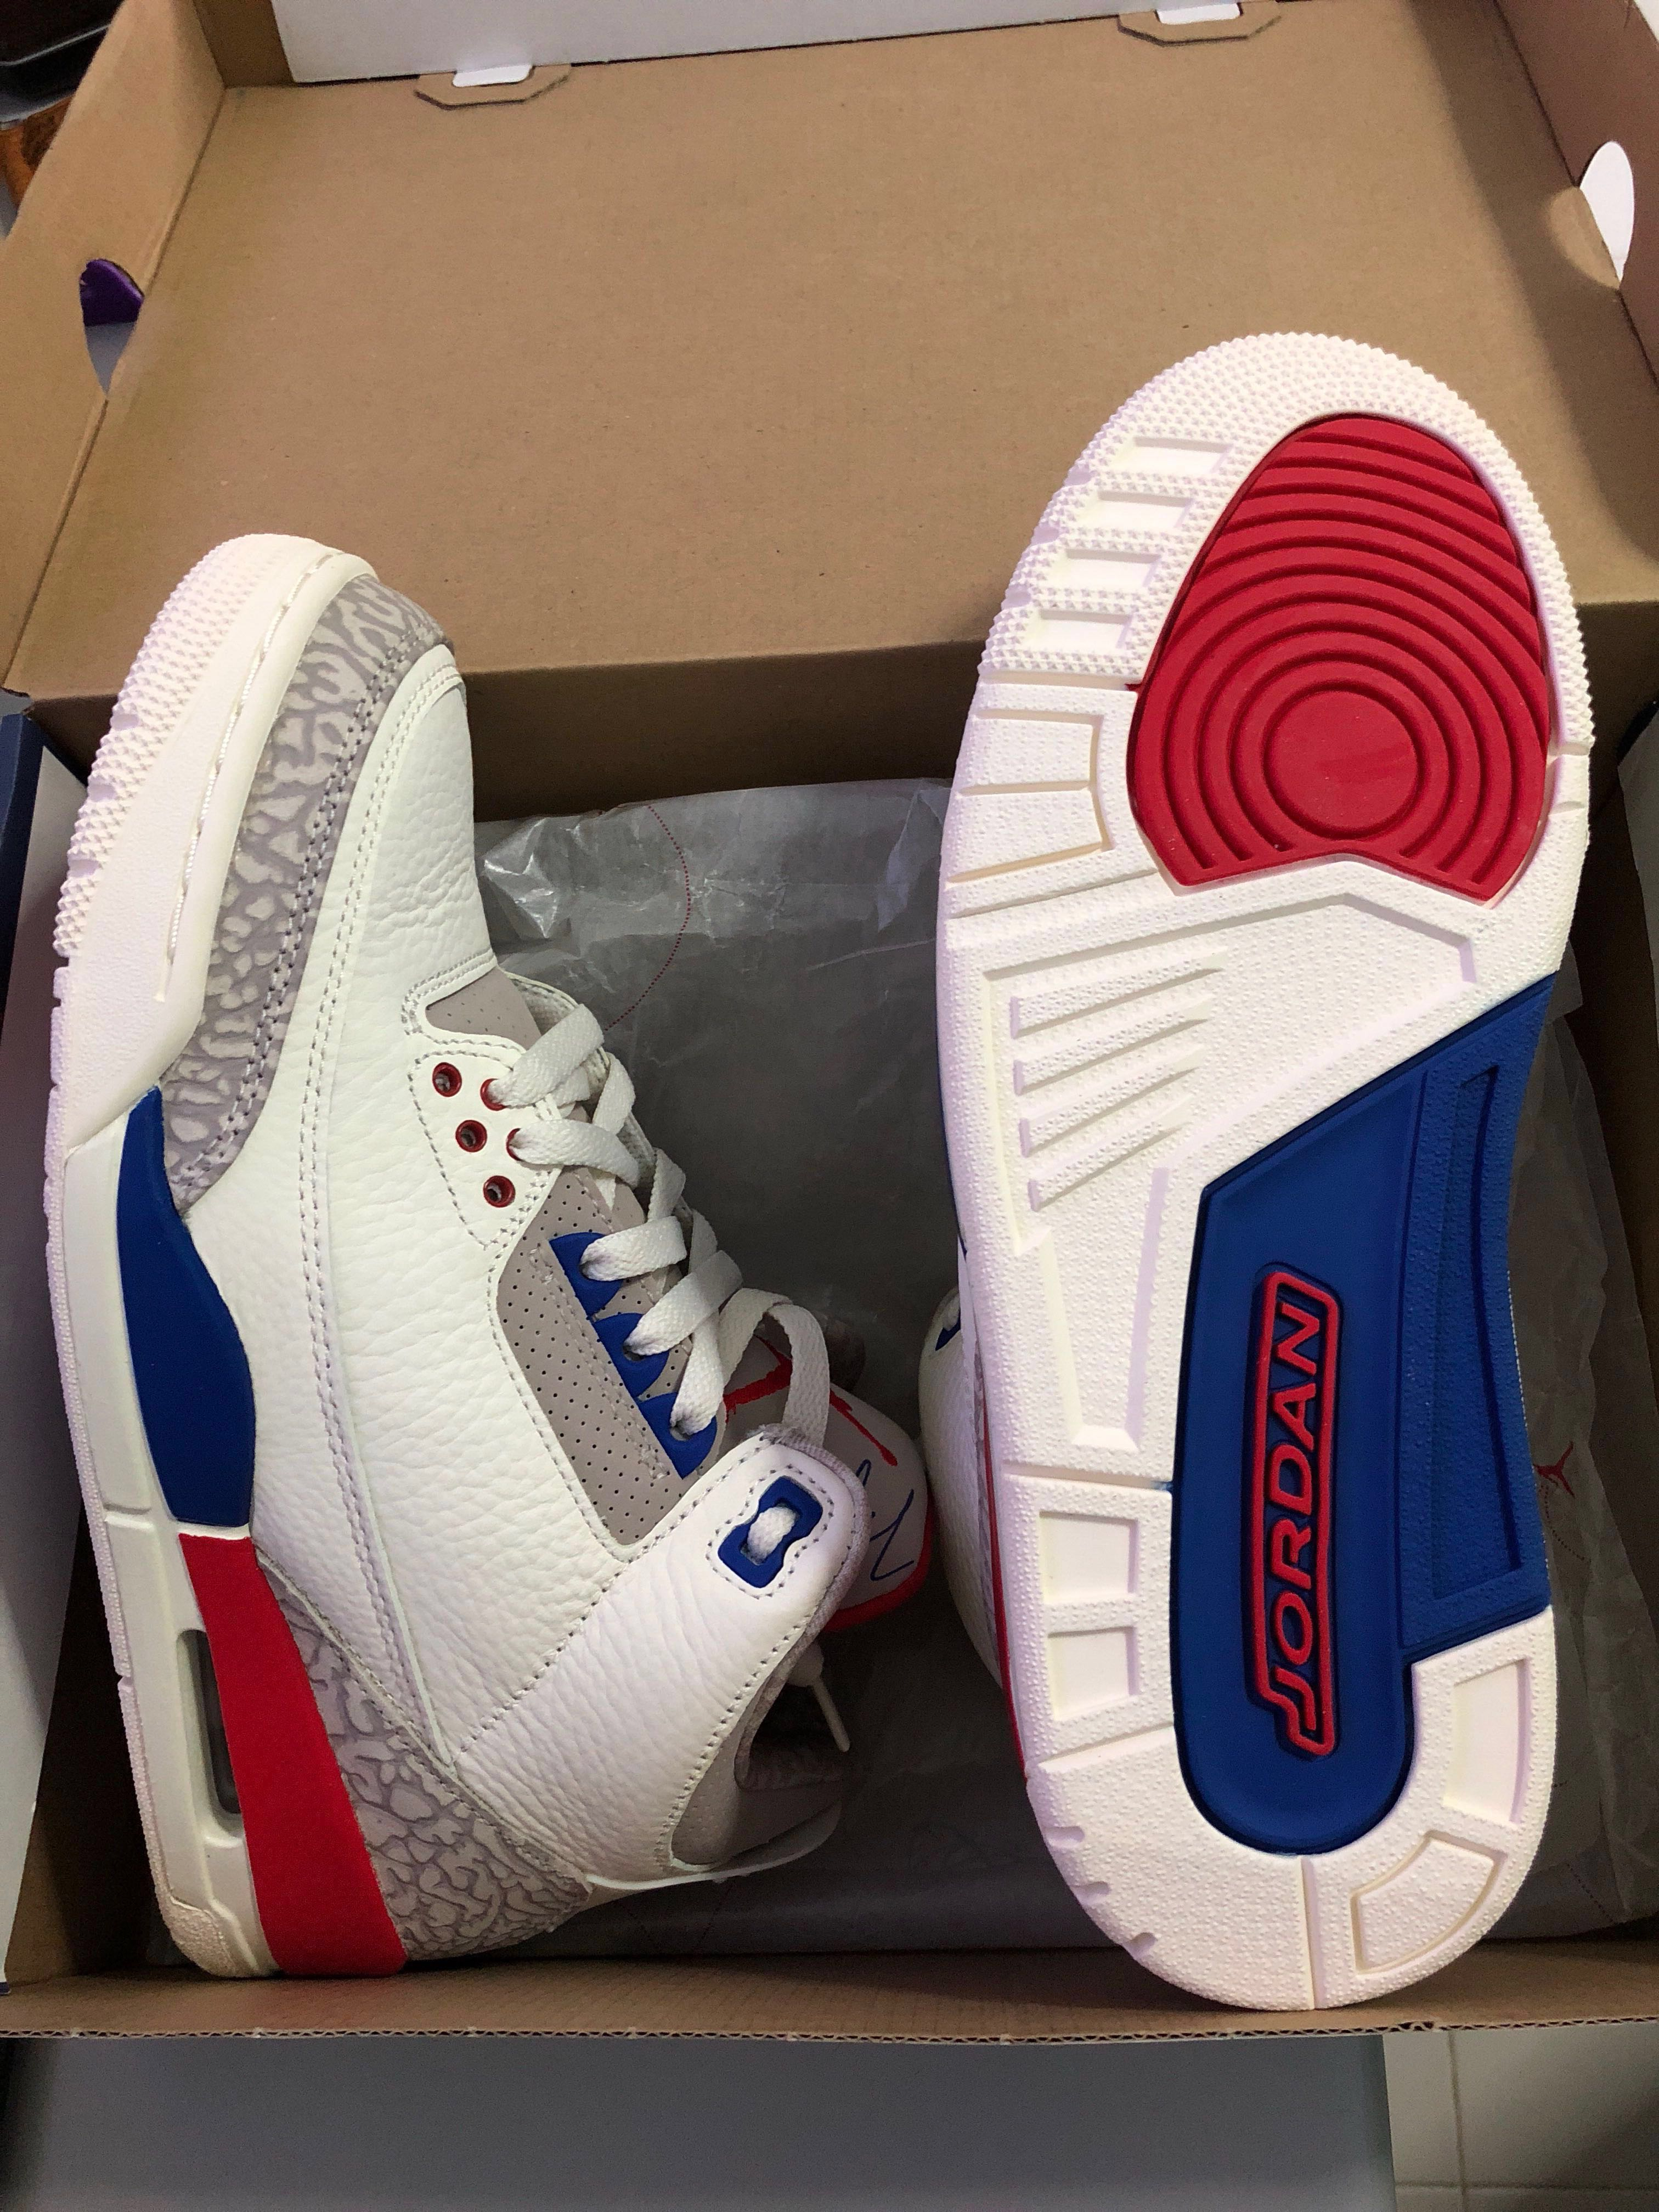 1468ff251bf98 Air Jordon 3 Retro, Men's Fashion, Footwear, Sneakers on Carousell